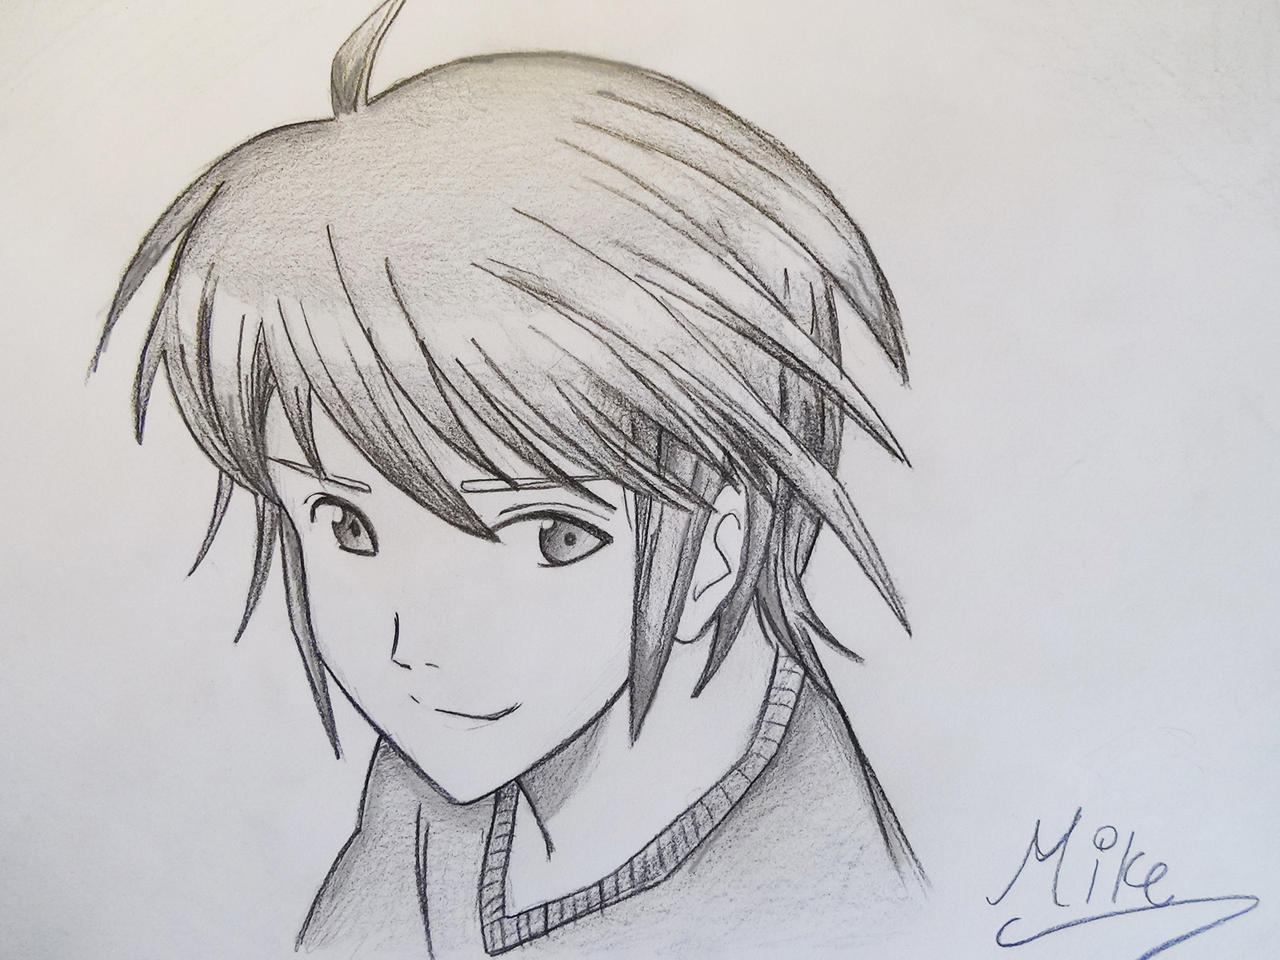 Manga Style Boy By Mcorderroure On Deviantart